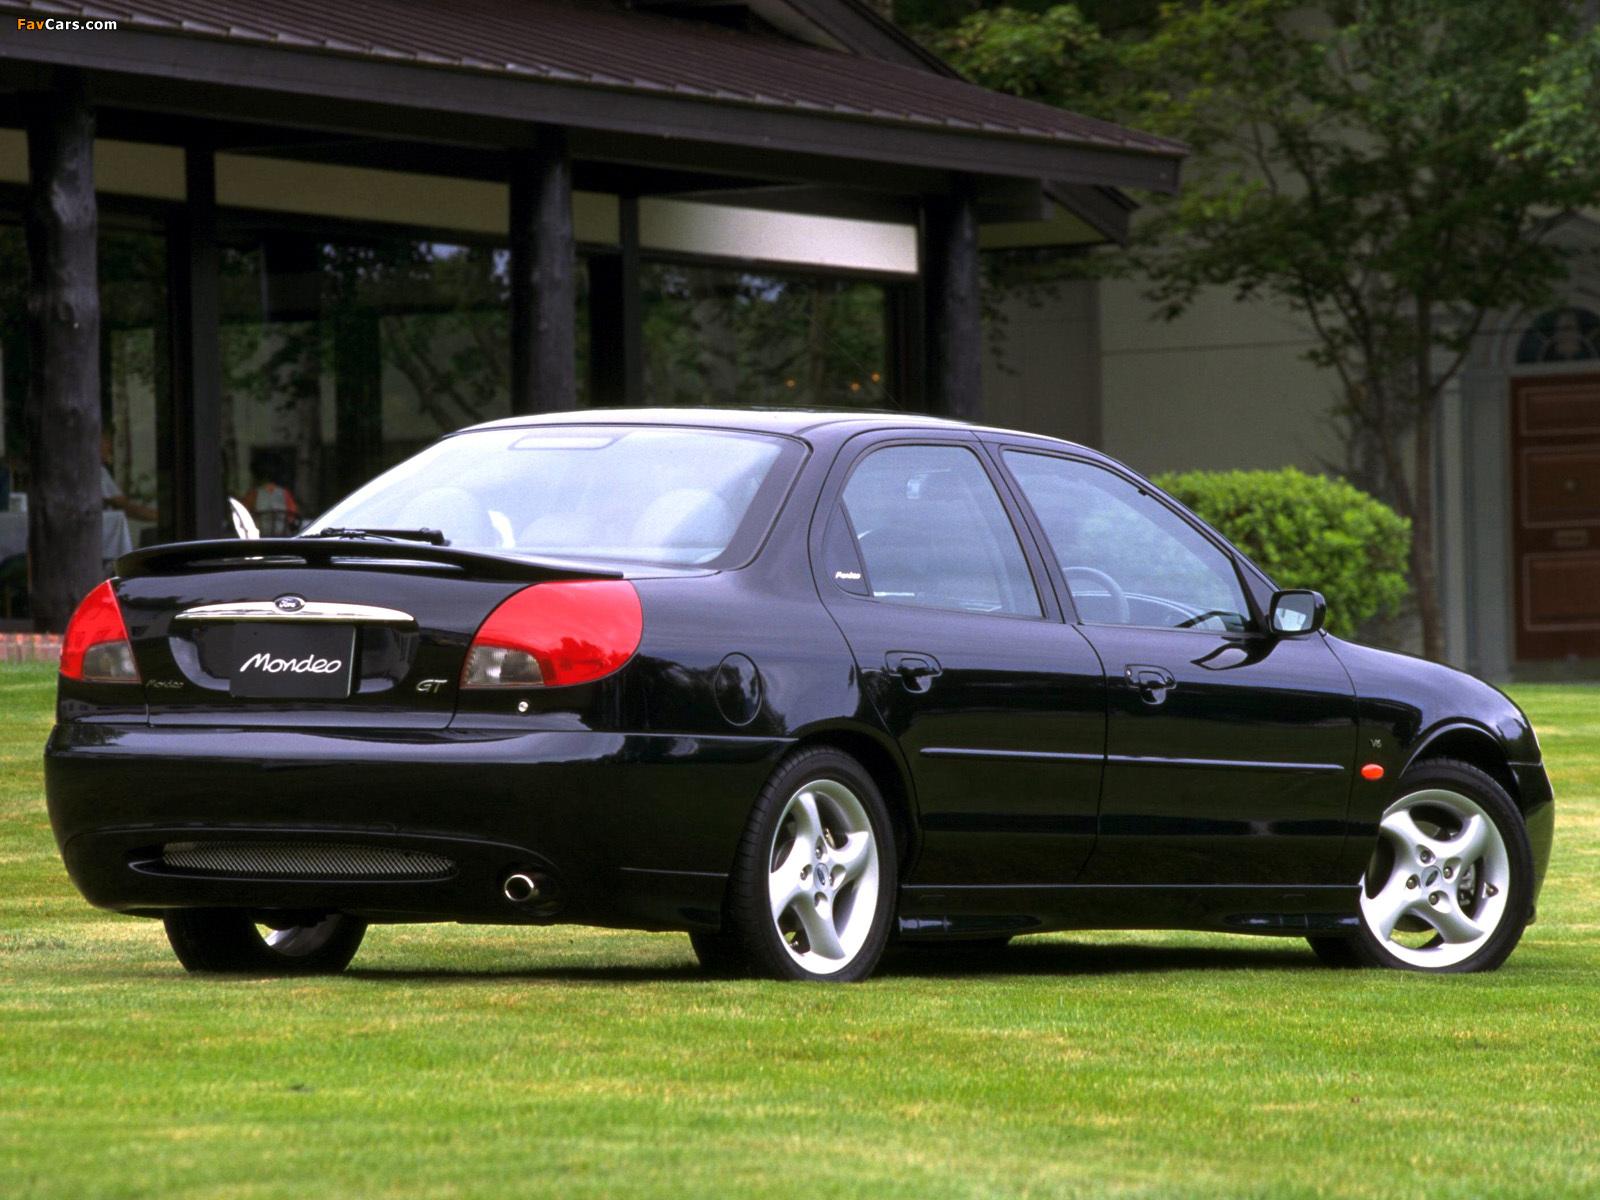 Ford Mondeo II 1996 - 2000 Sedan #3